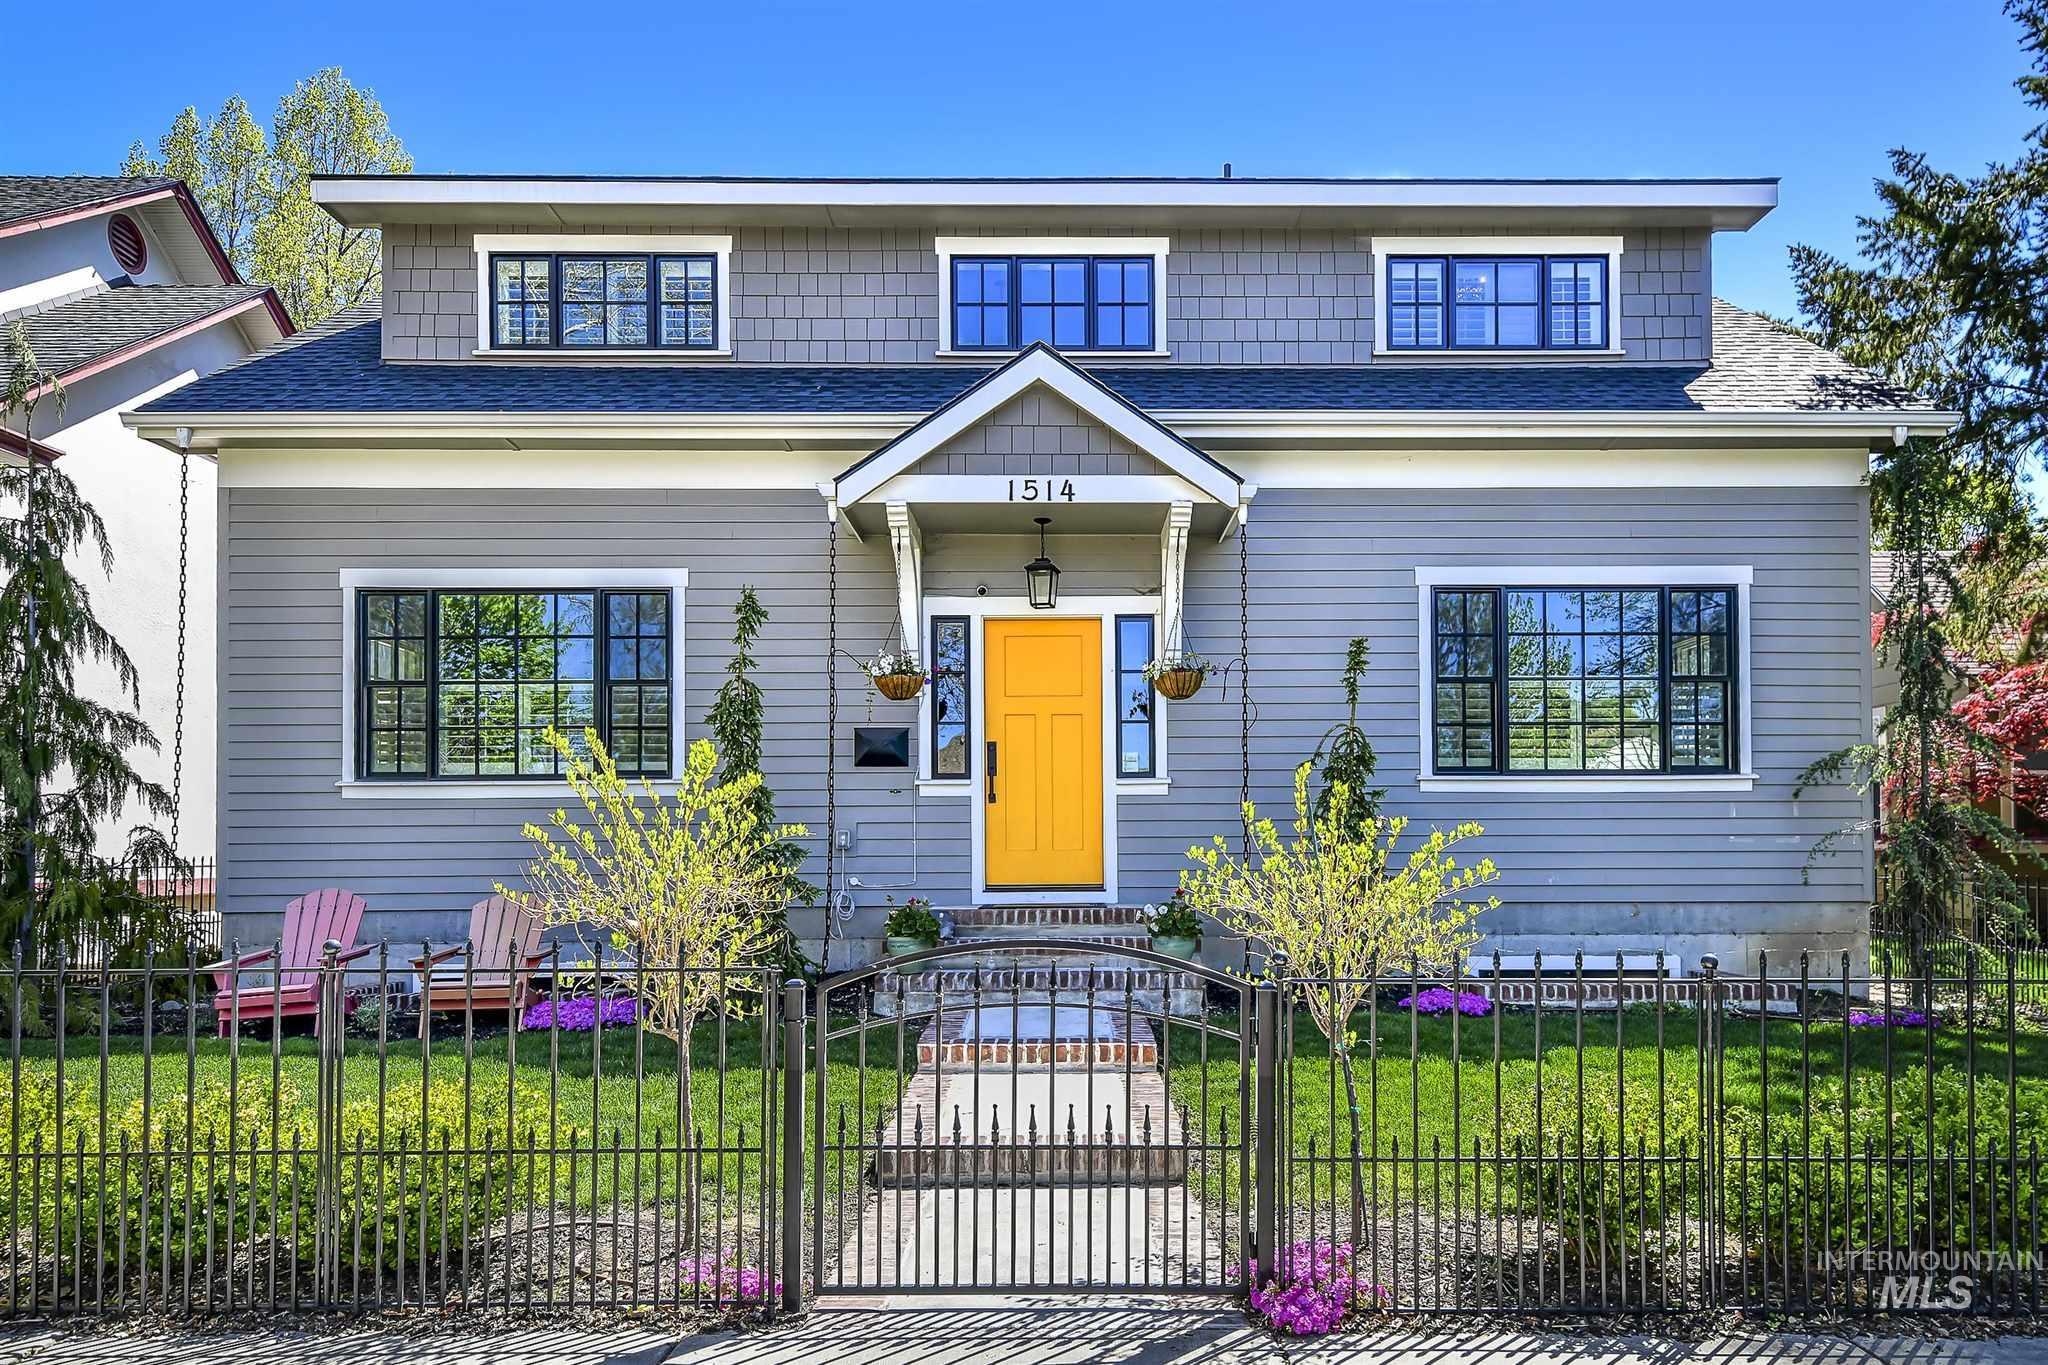 1514 N 12 Property Photo - Boise, ID real estate listing